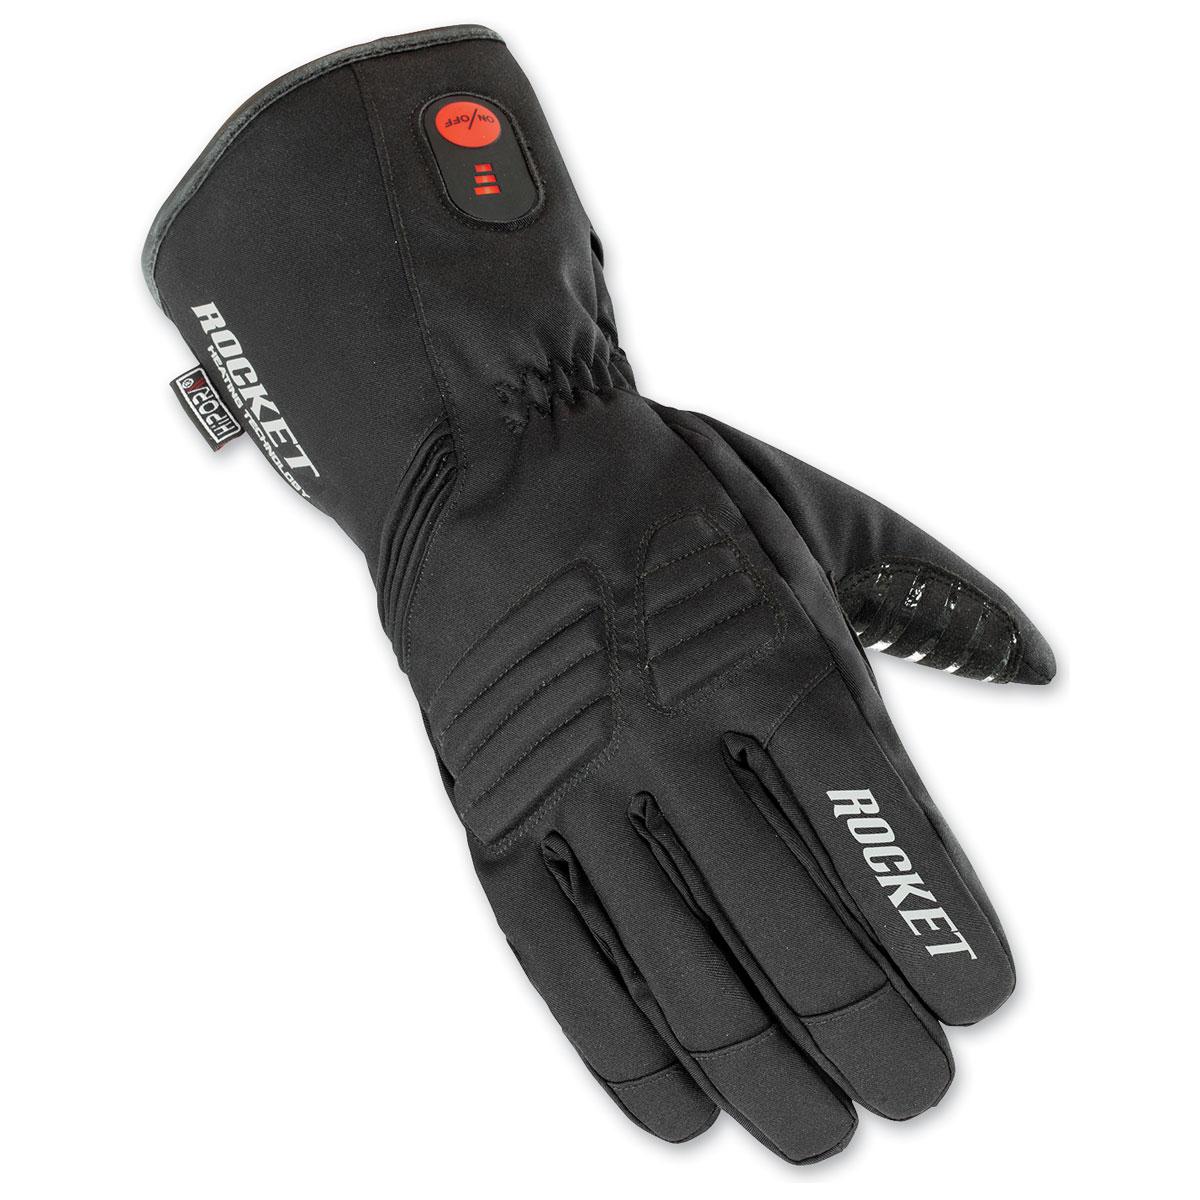 Joe Rocket Men's Rocker Burner Textile Heated Black Gloves